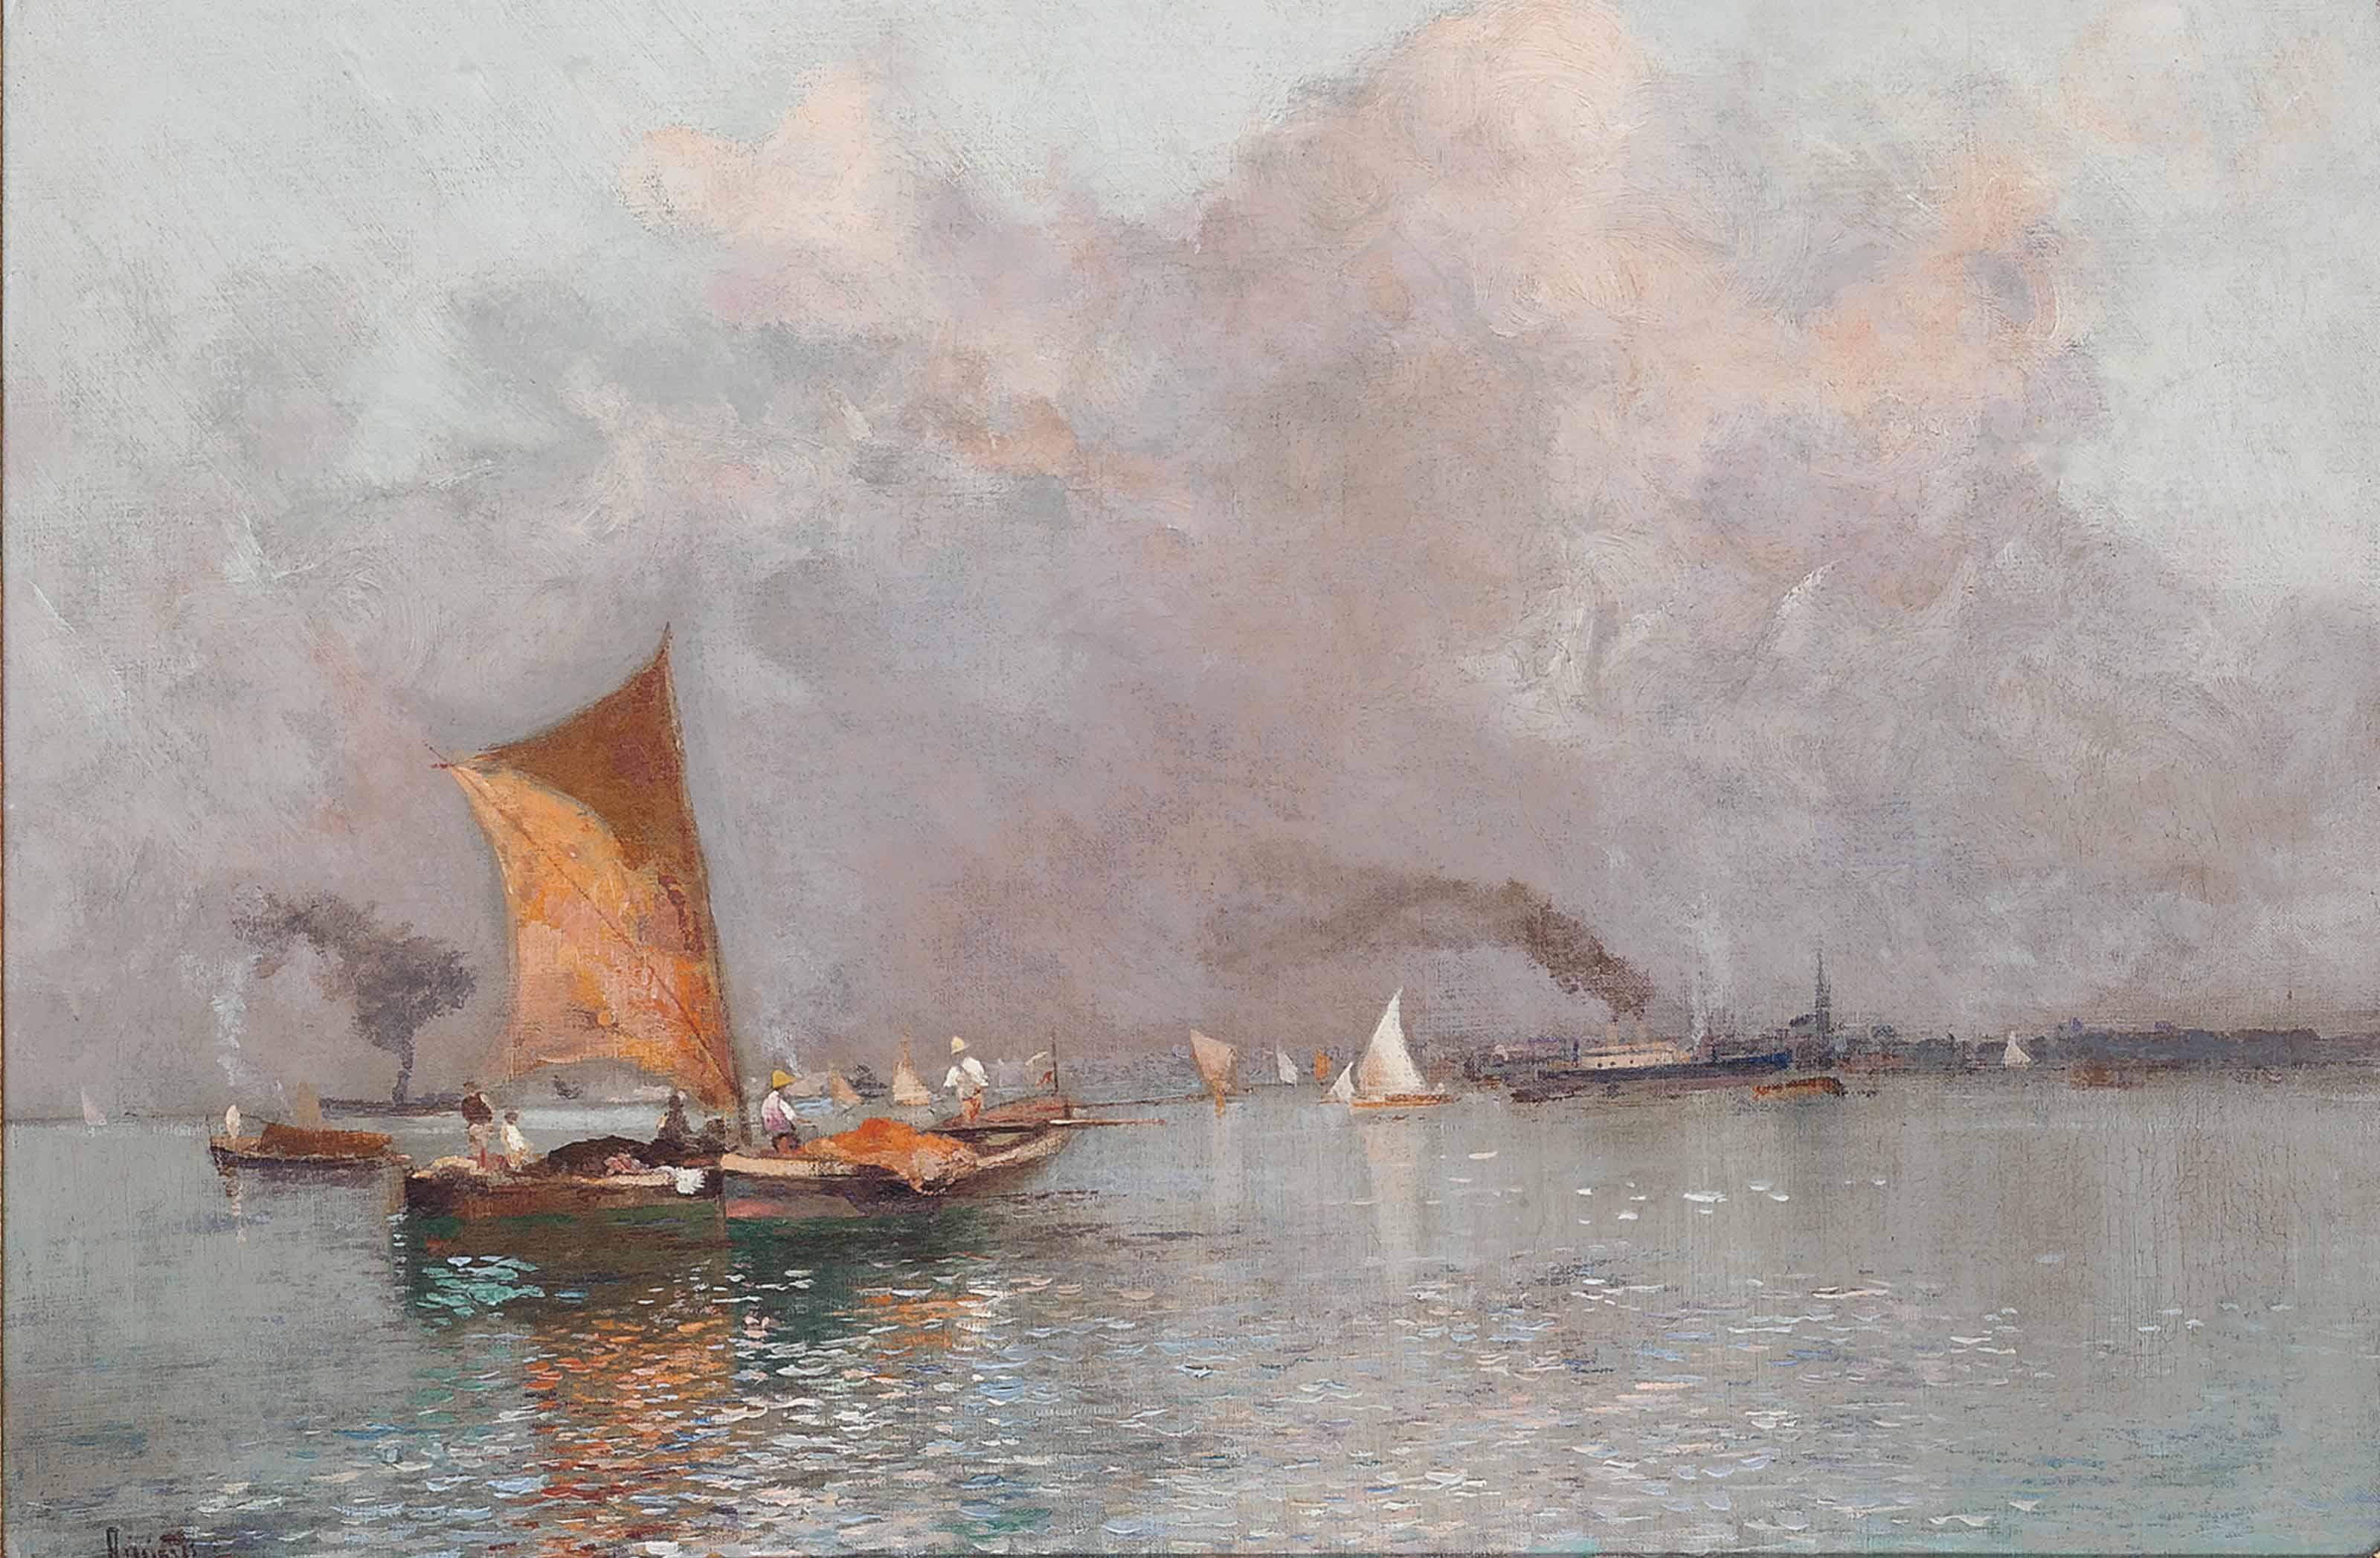 Fishing vessels off the Neapolitan coast